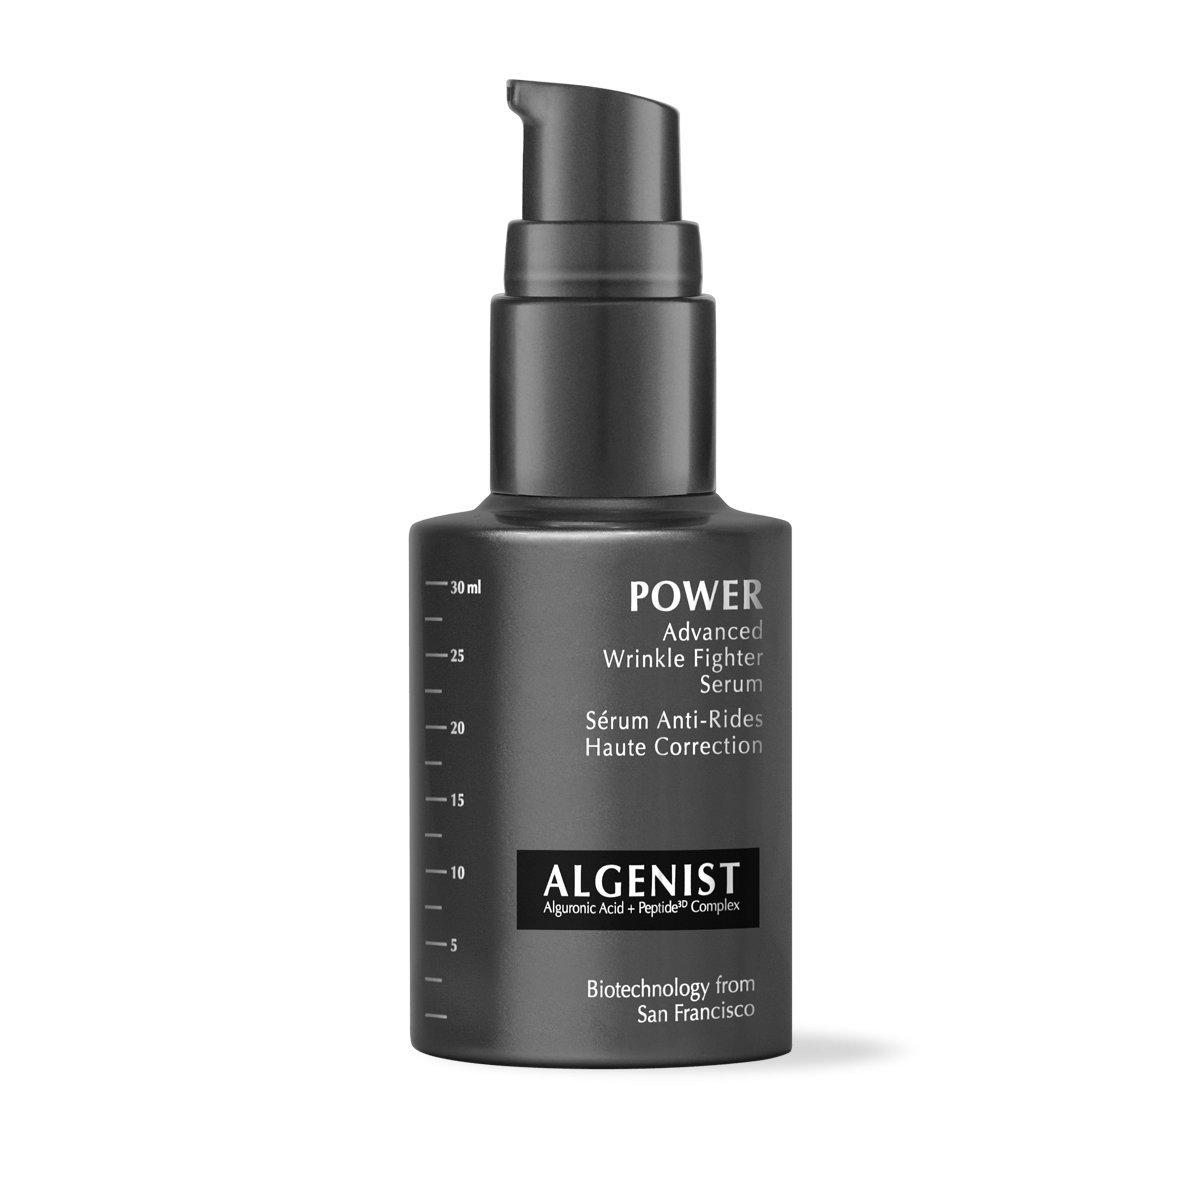 Algenist Power Advanced Wrinkle Fighting Serum, 1 oz